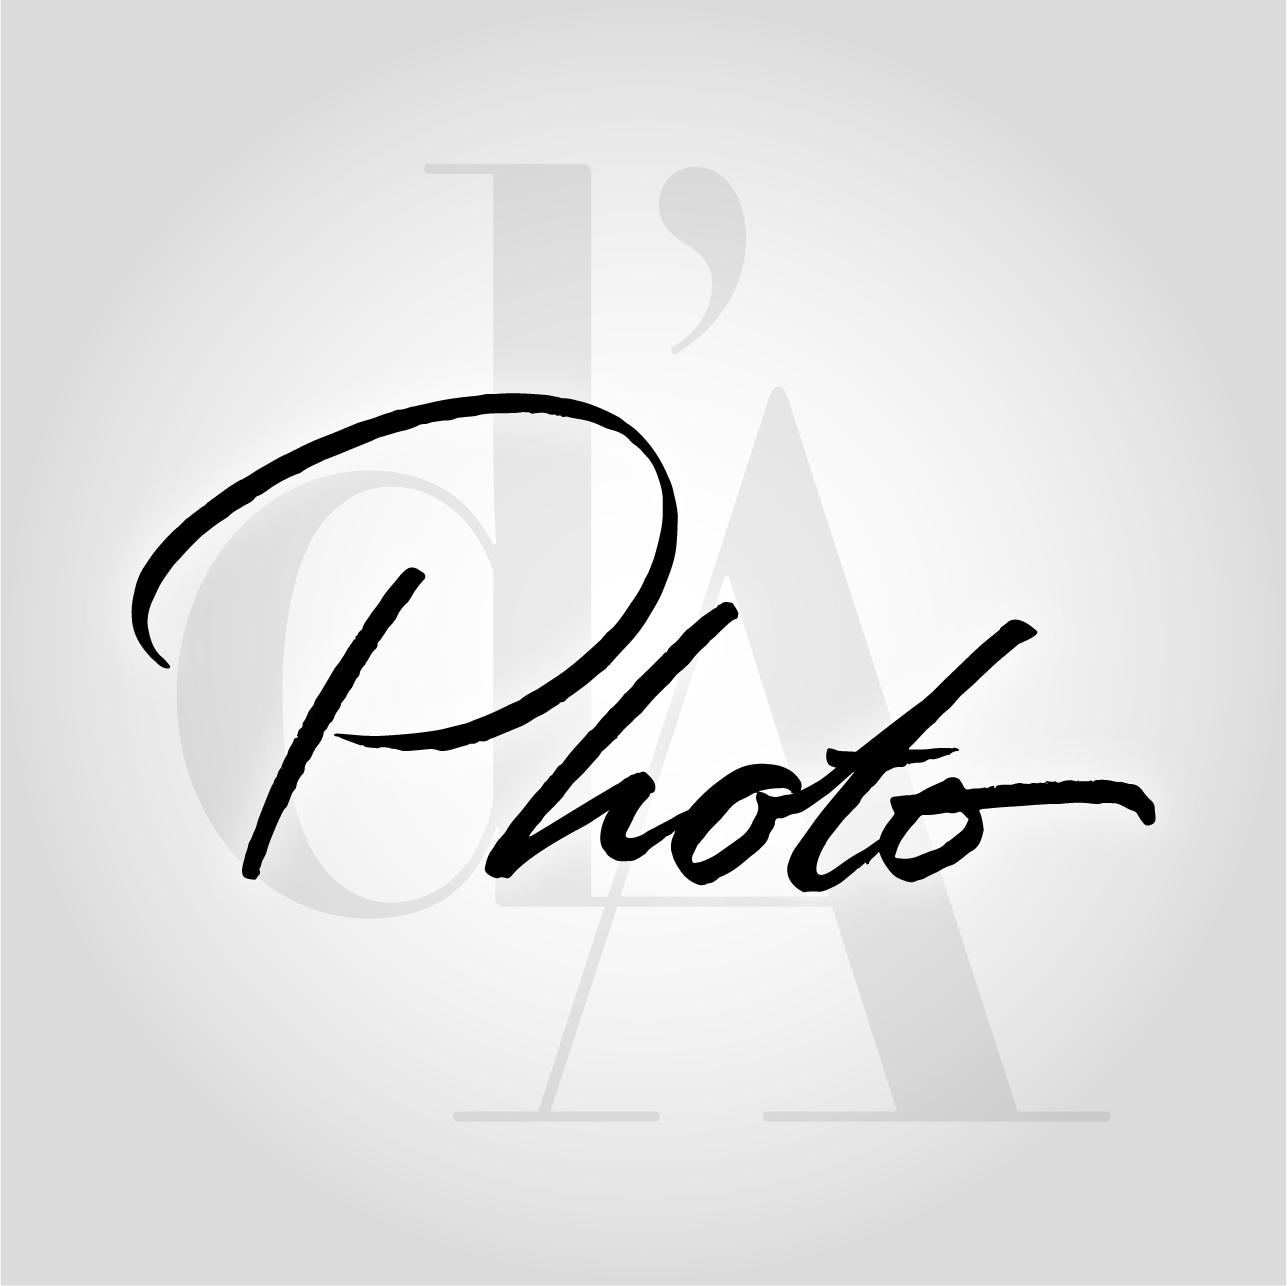 d'Artiste - Photography